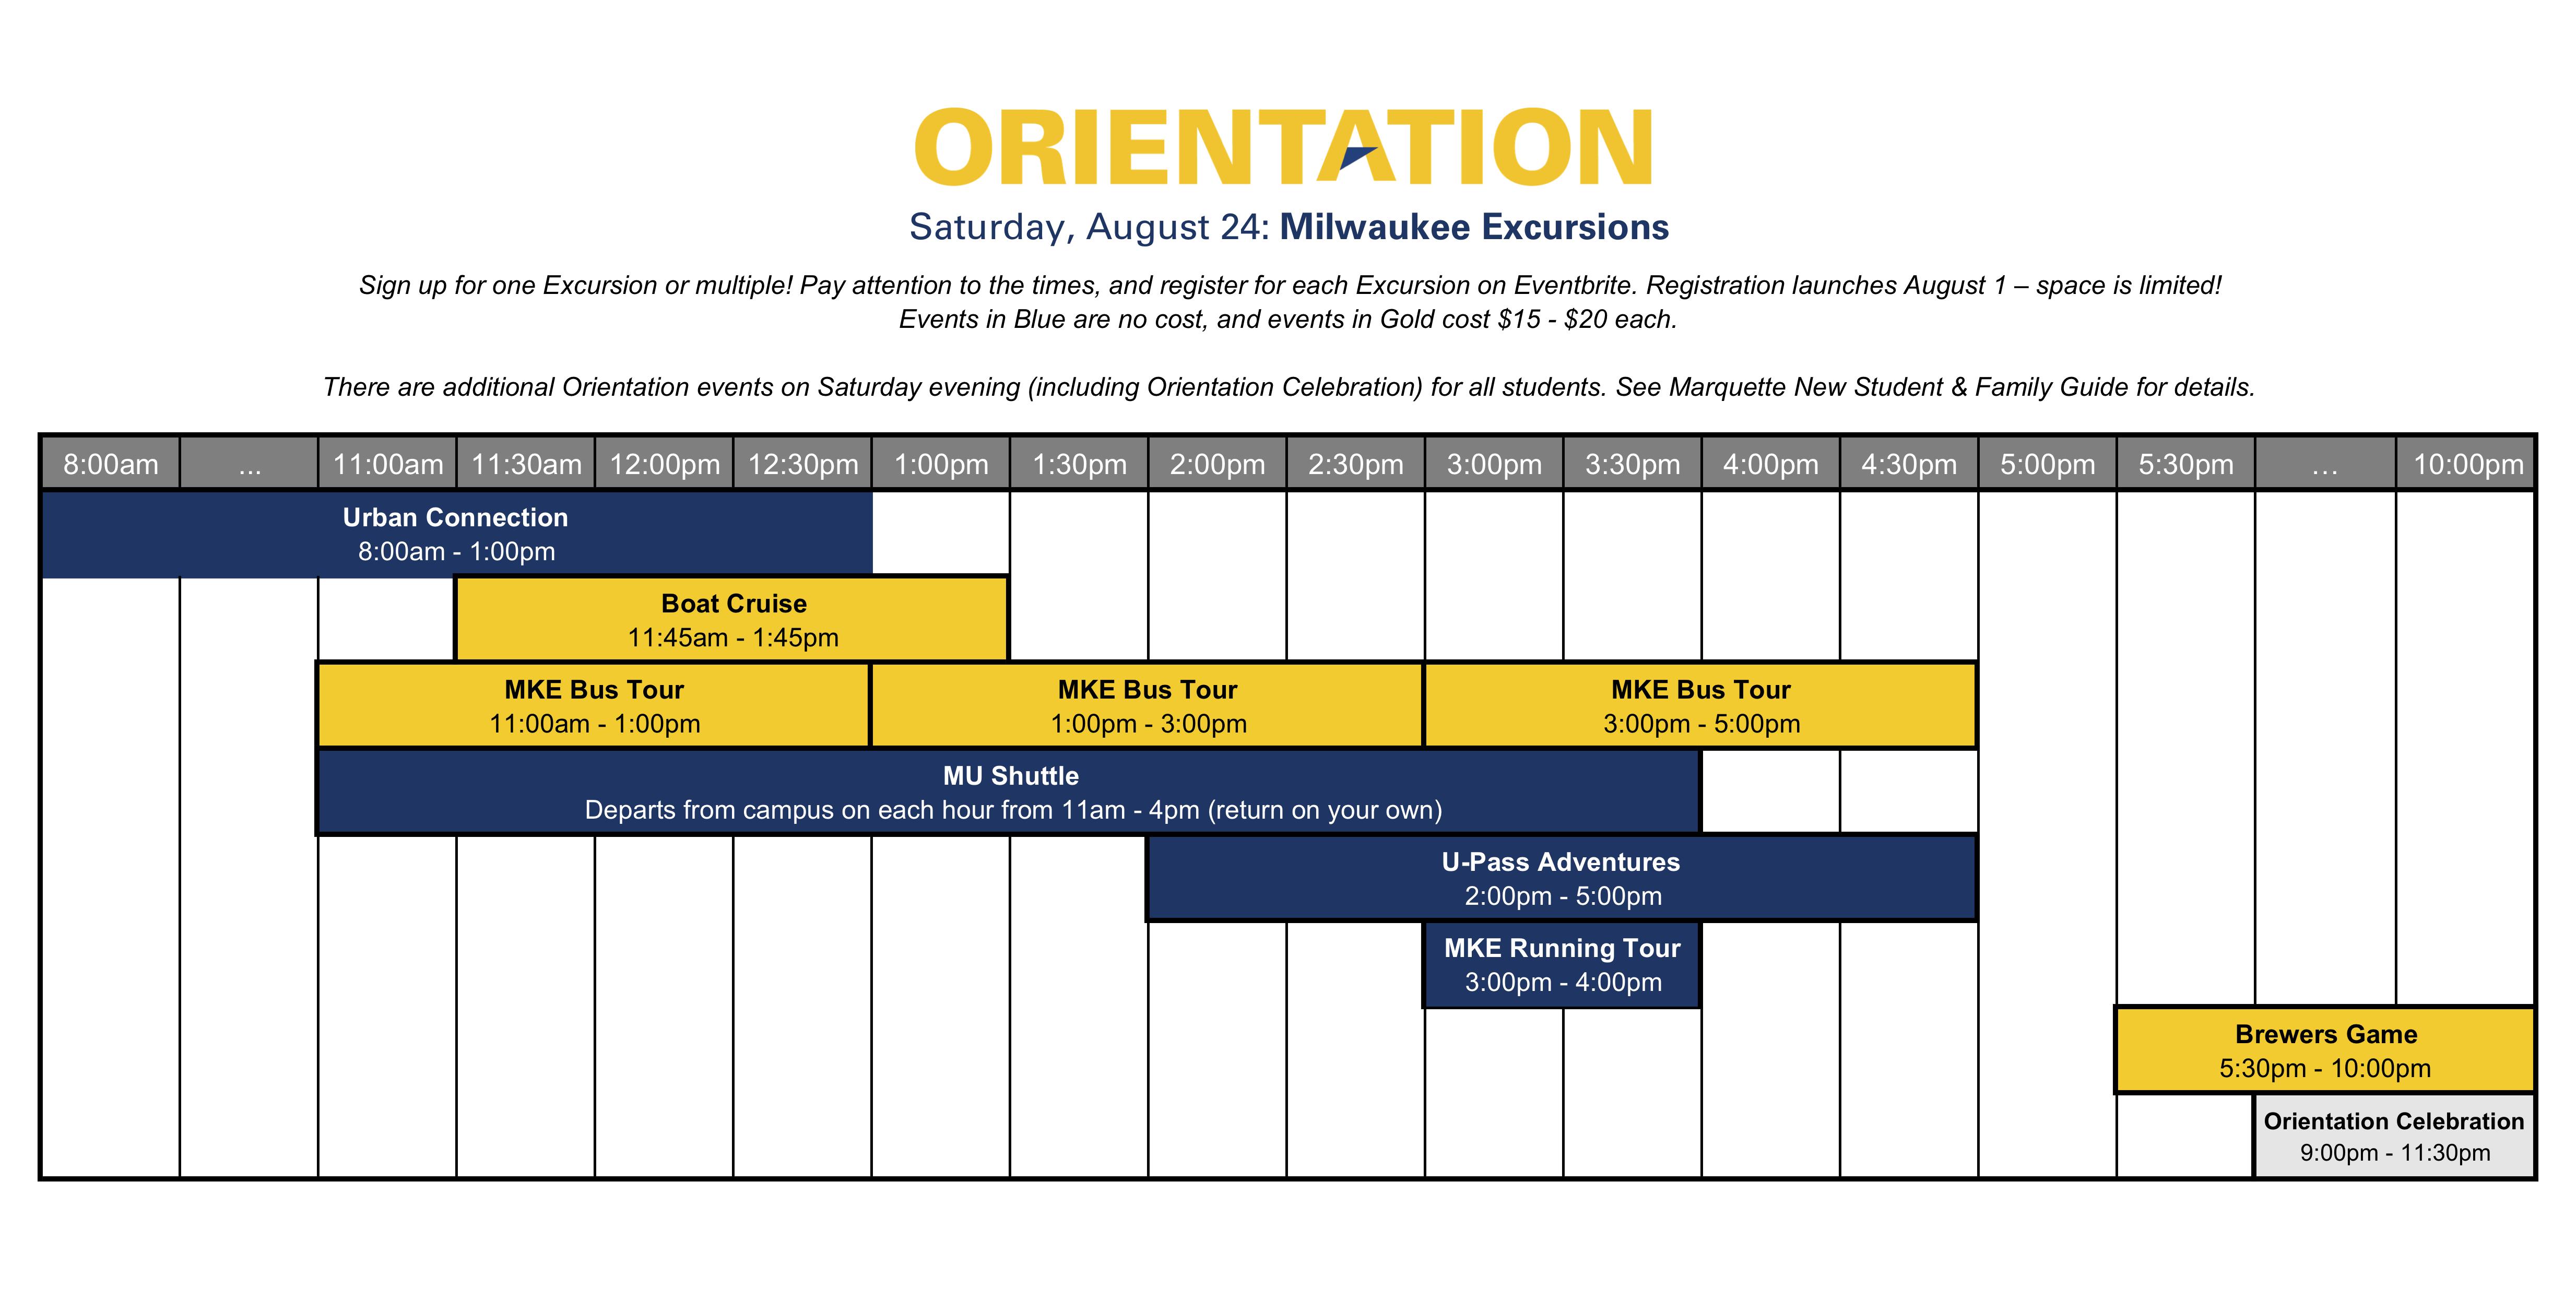 Marquette Calendar 2019 Marquette Orientation 2019   Milwaukee Excursions Tickets, Sat